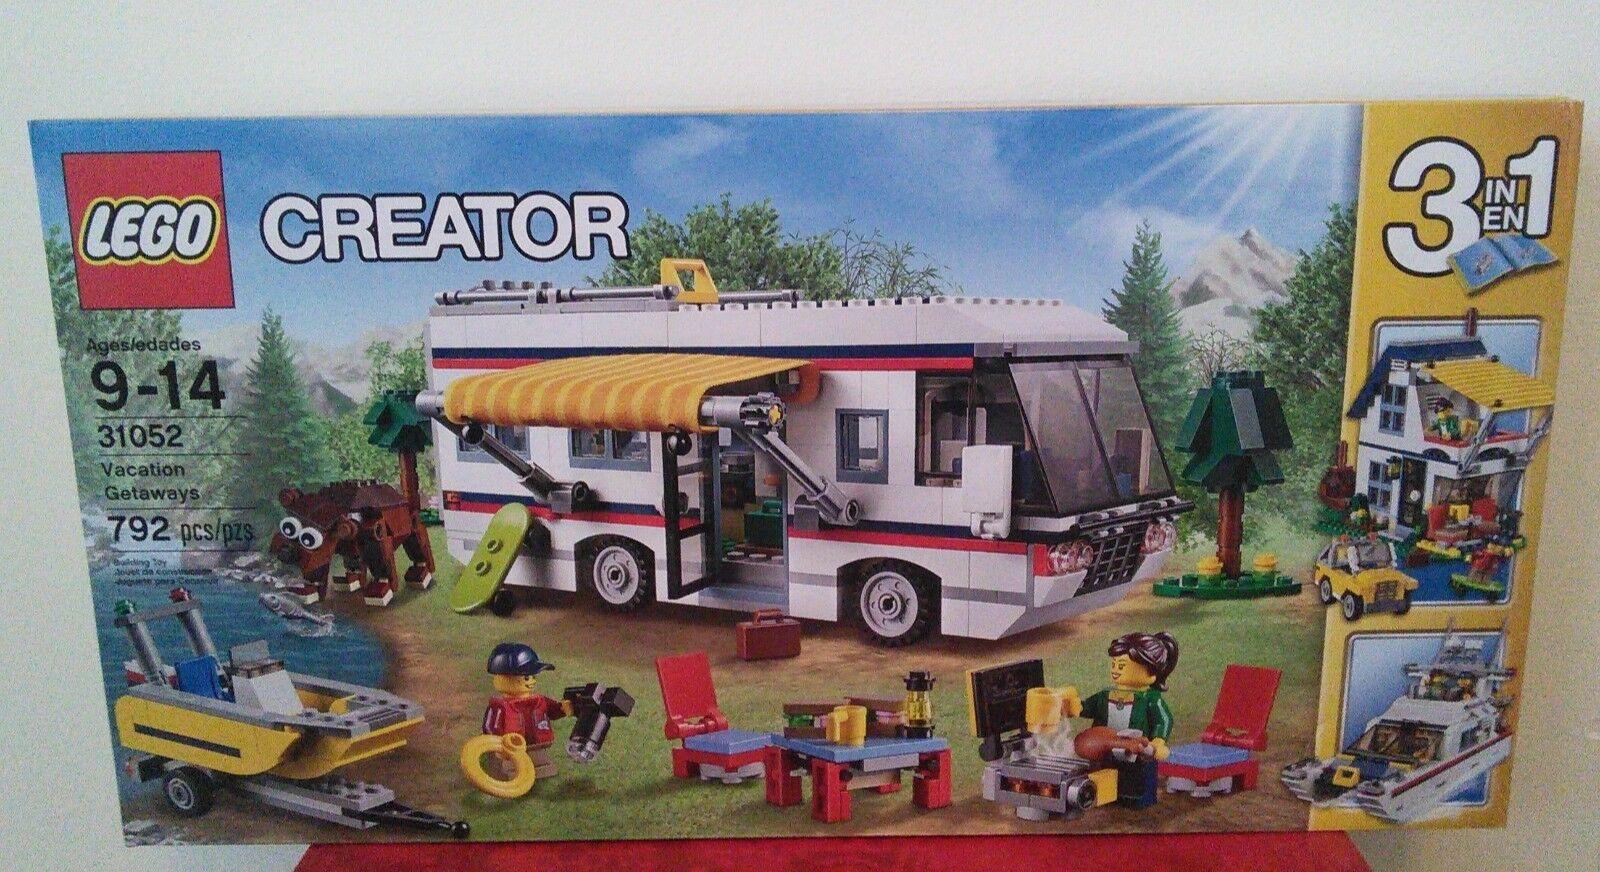 LEGO KREATUR 31052 YRKESUTBILDER 7992 PCS